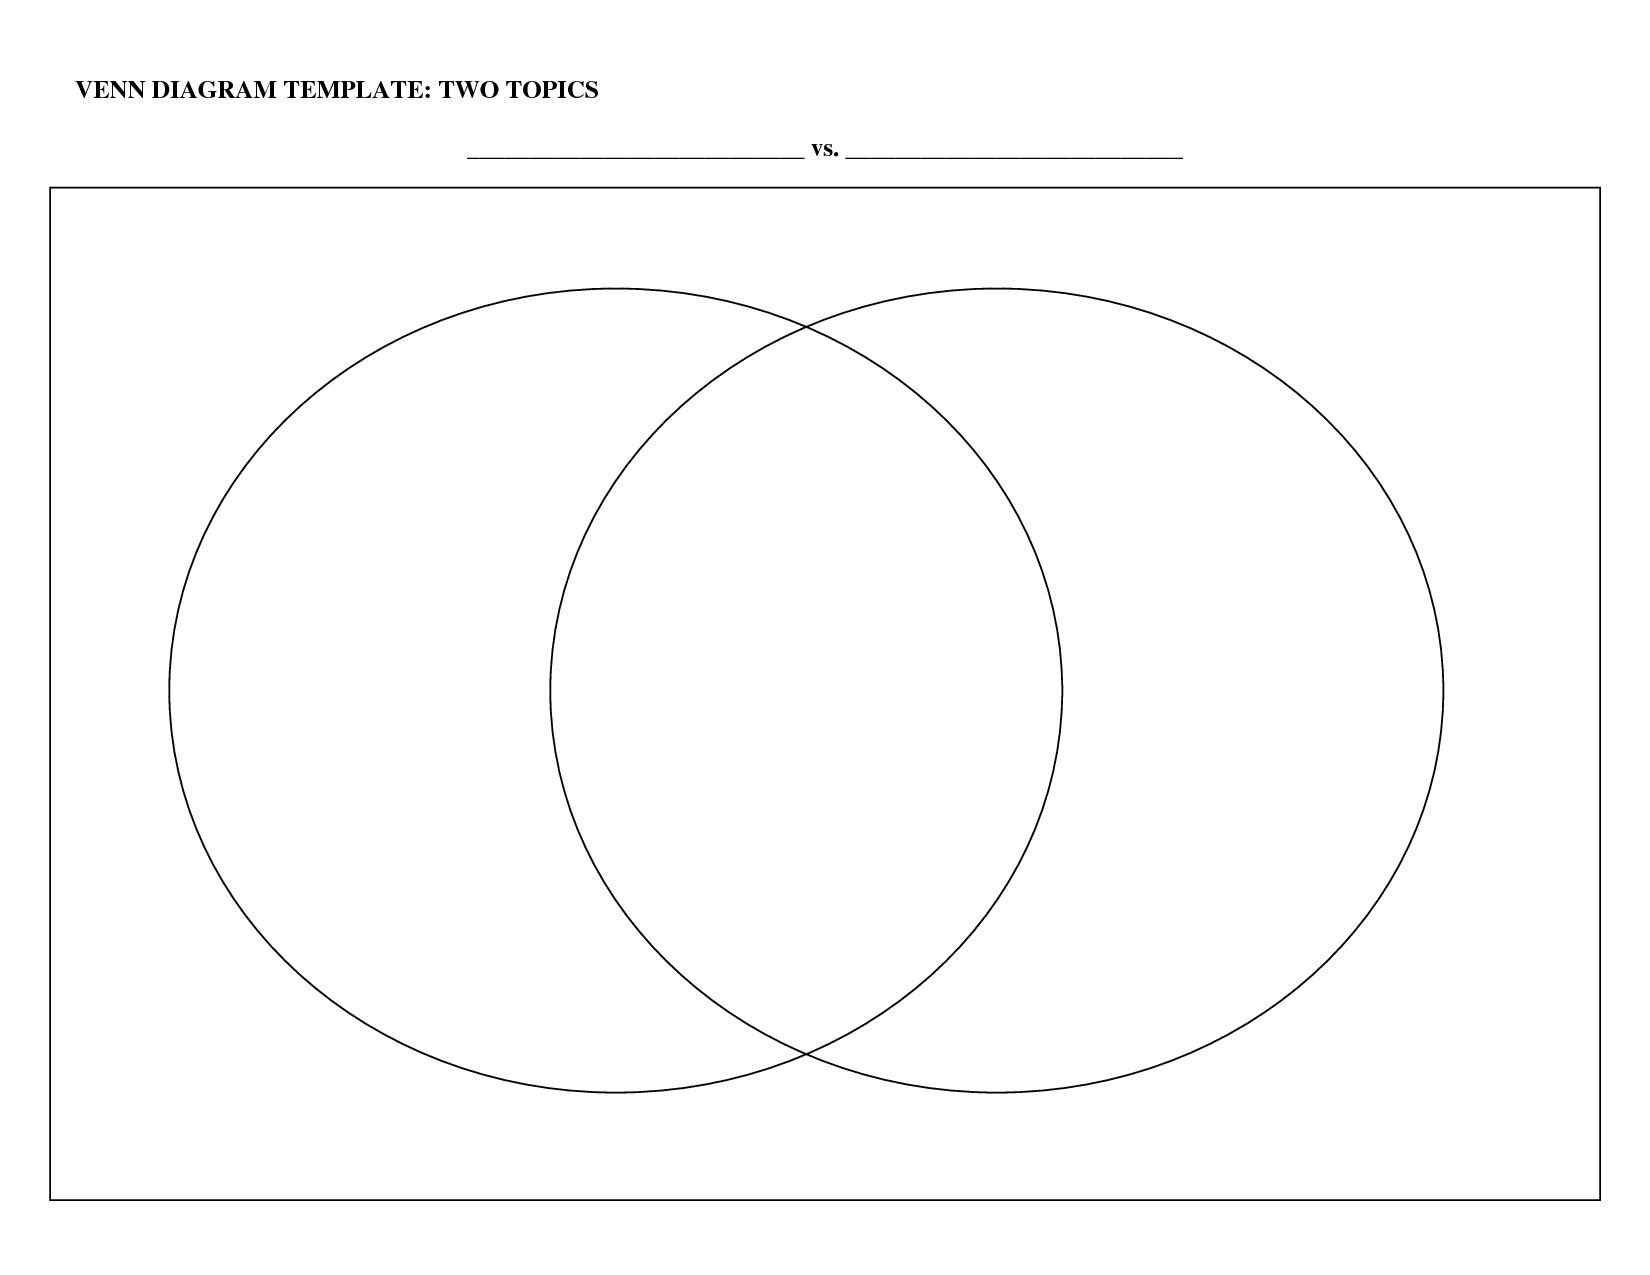 venn diagram template - Google Search | Graphic Organisers | Pinterest